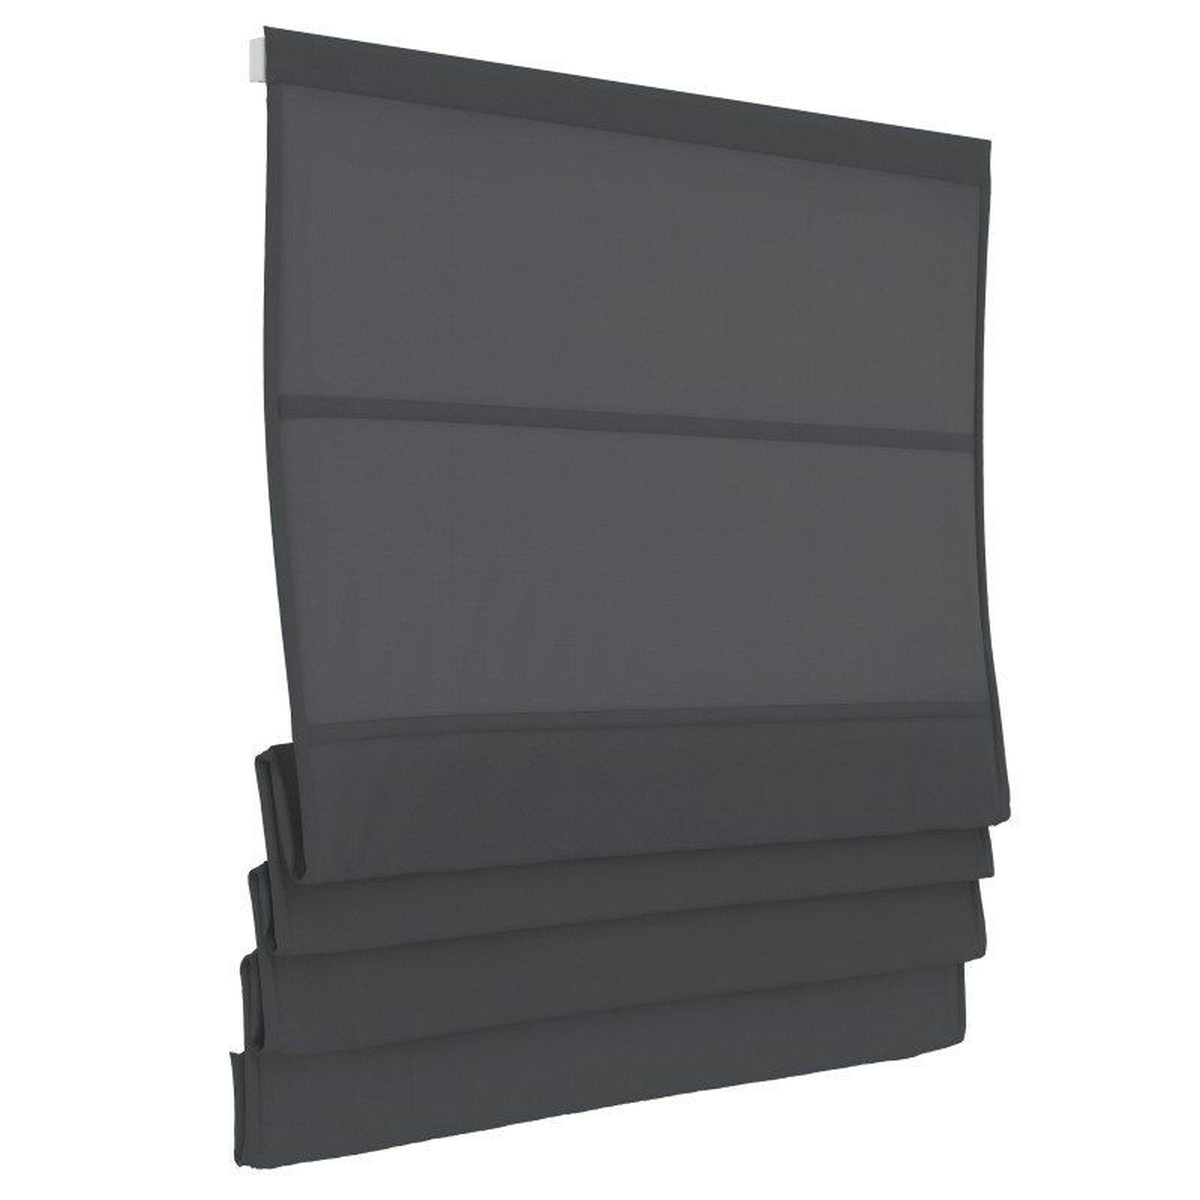 Vouwgordijn - Antraciet - Lichtdoorlatend - 100cm x 180cm